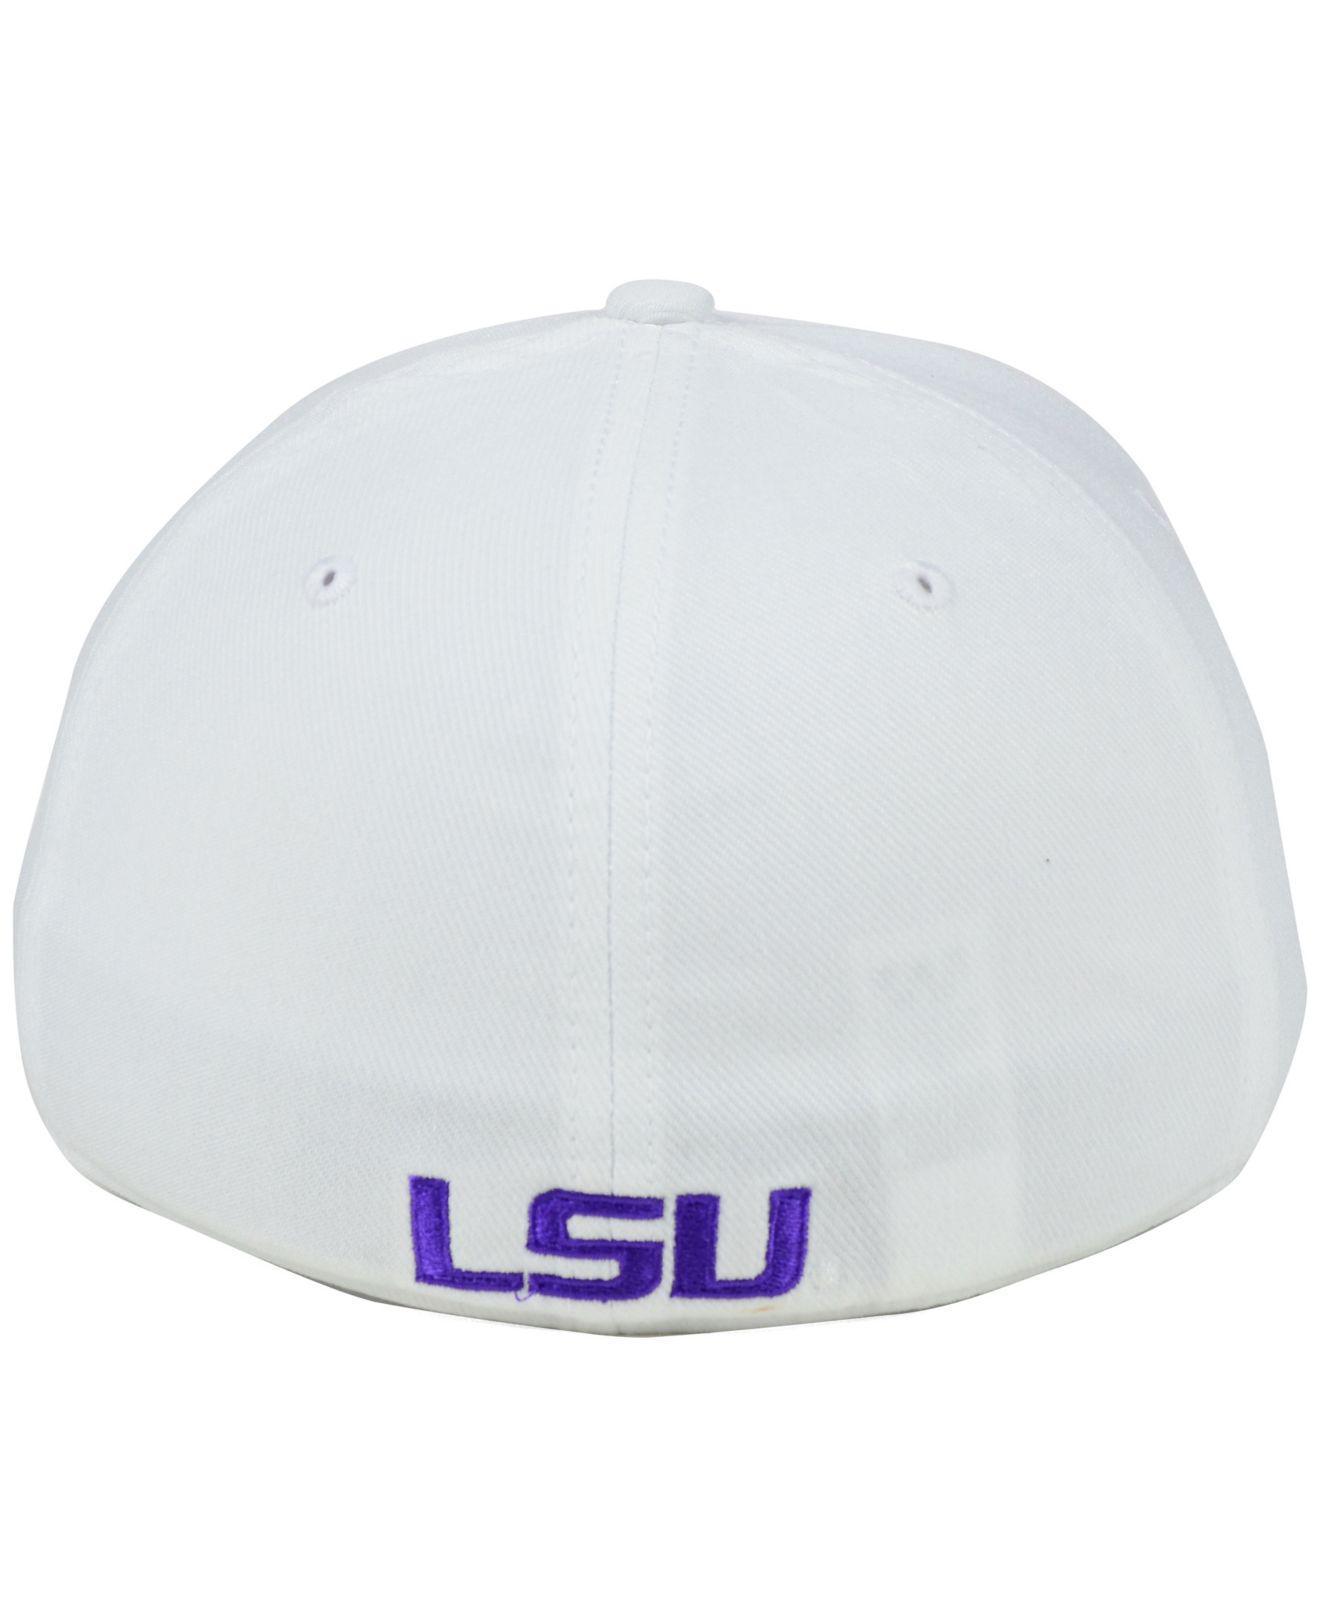 08af7cd5 Nike - White Lsu Tigers Classic Swoosh Cap for Men - Lyst. View fullscreen